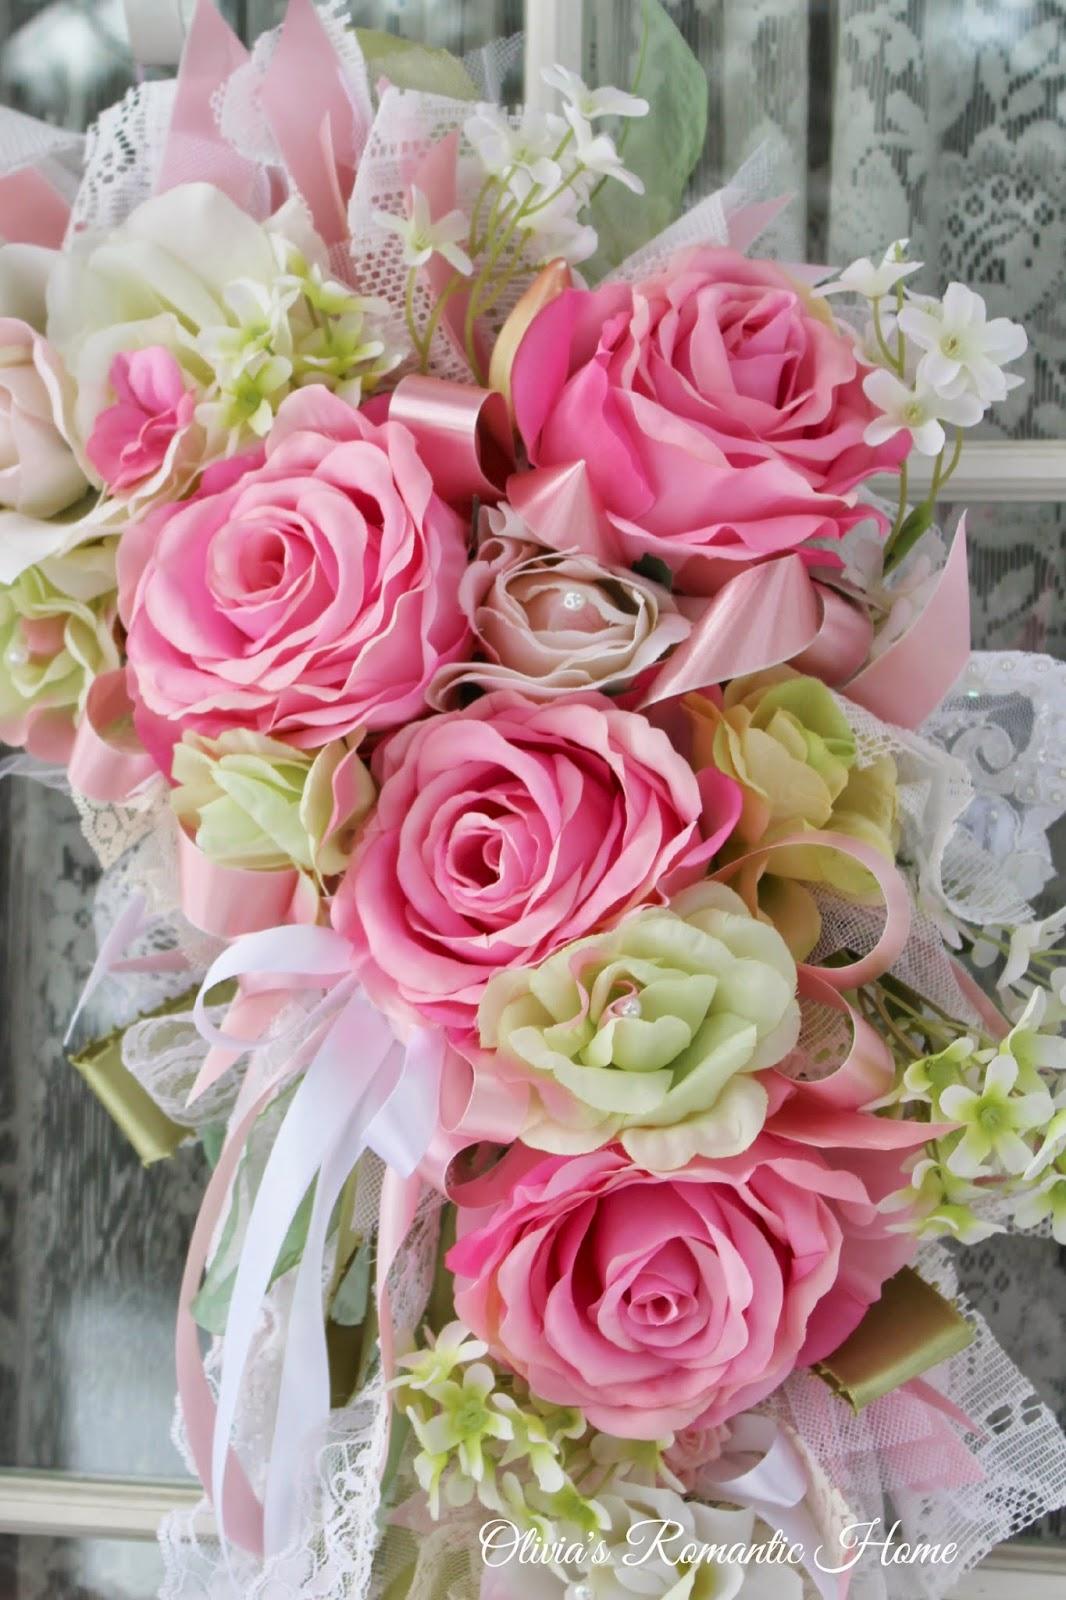 olivia 39 s romantic home marie antoinette rose garden wreath. Black Bedroom Furniture Sets. Home Design Ideas